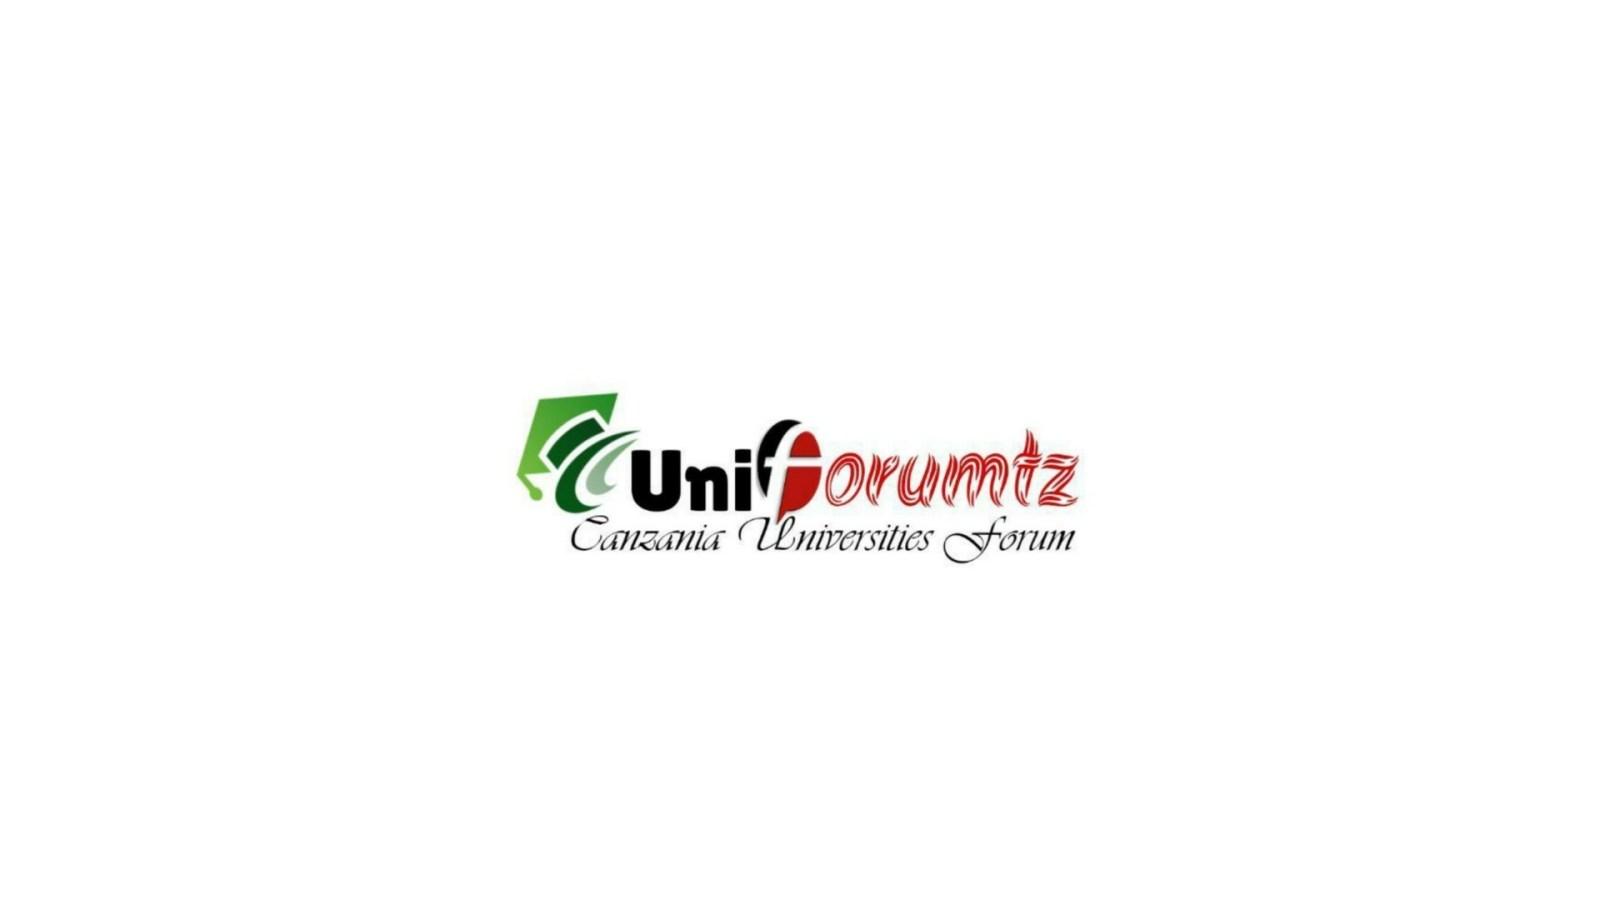 Uniforumtz Ajira Mpya Tanzania Jobs Tanzania SEO Tips